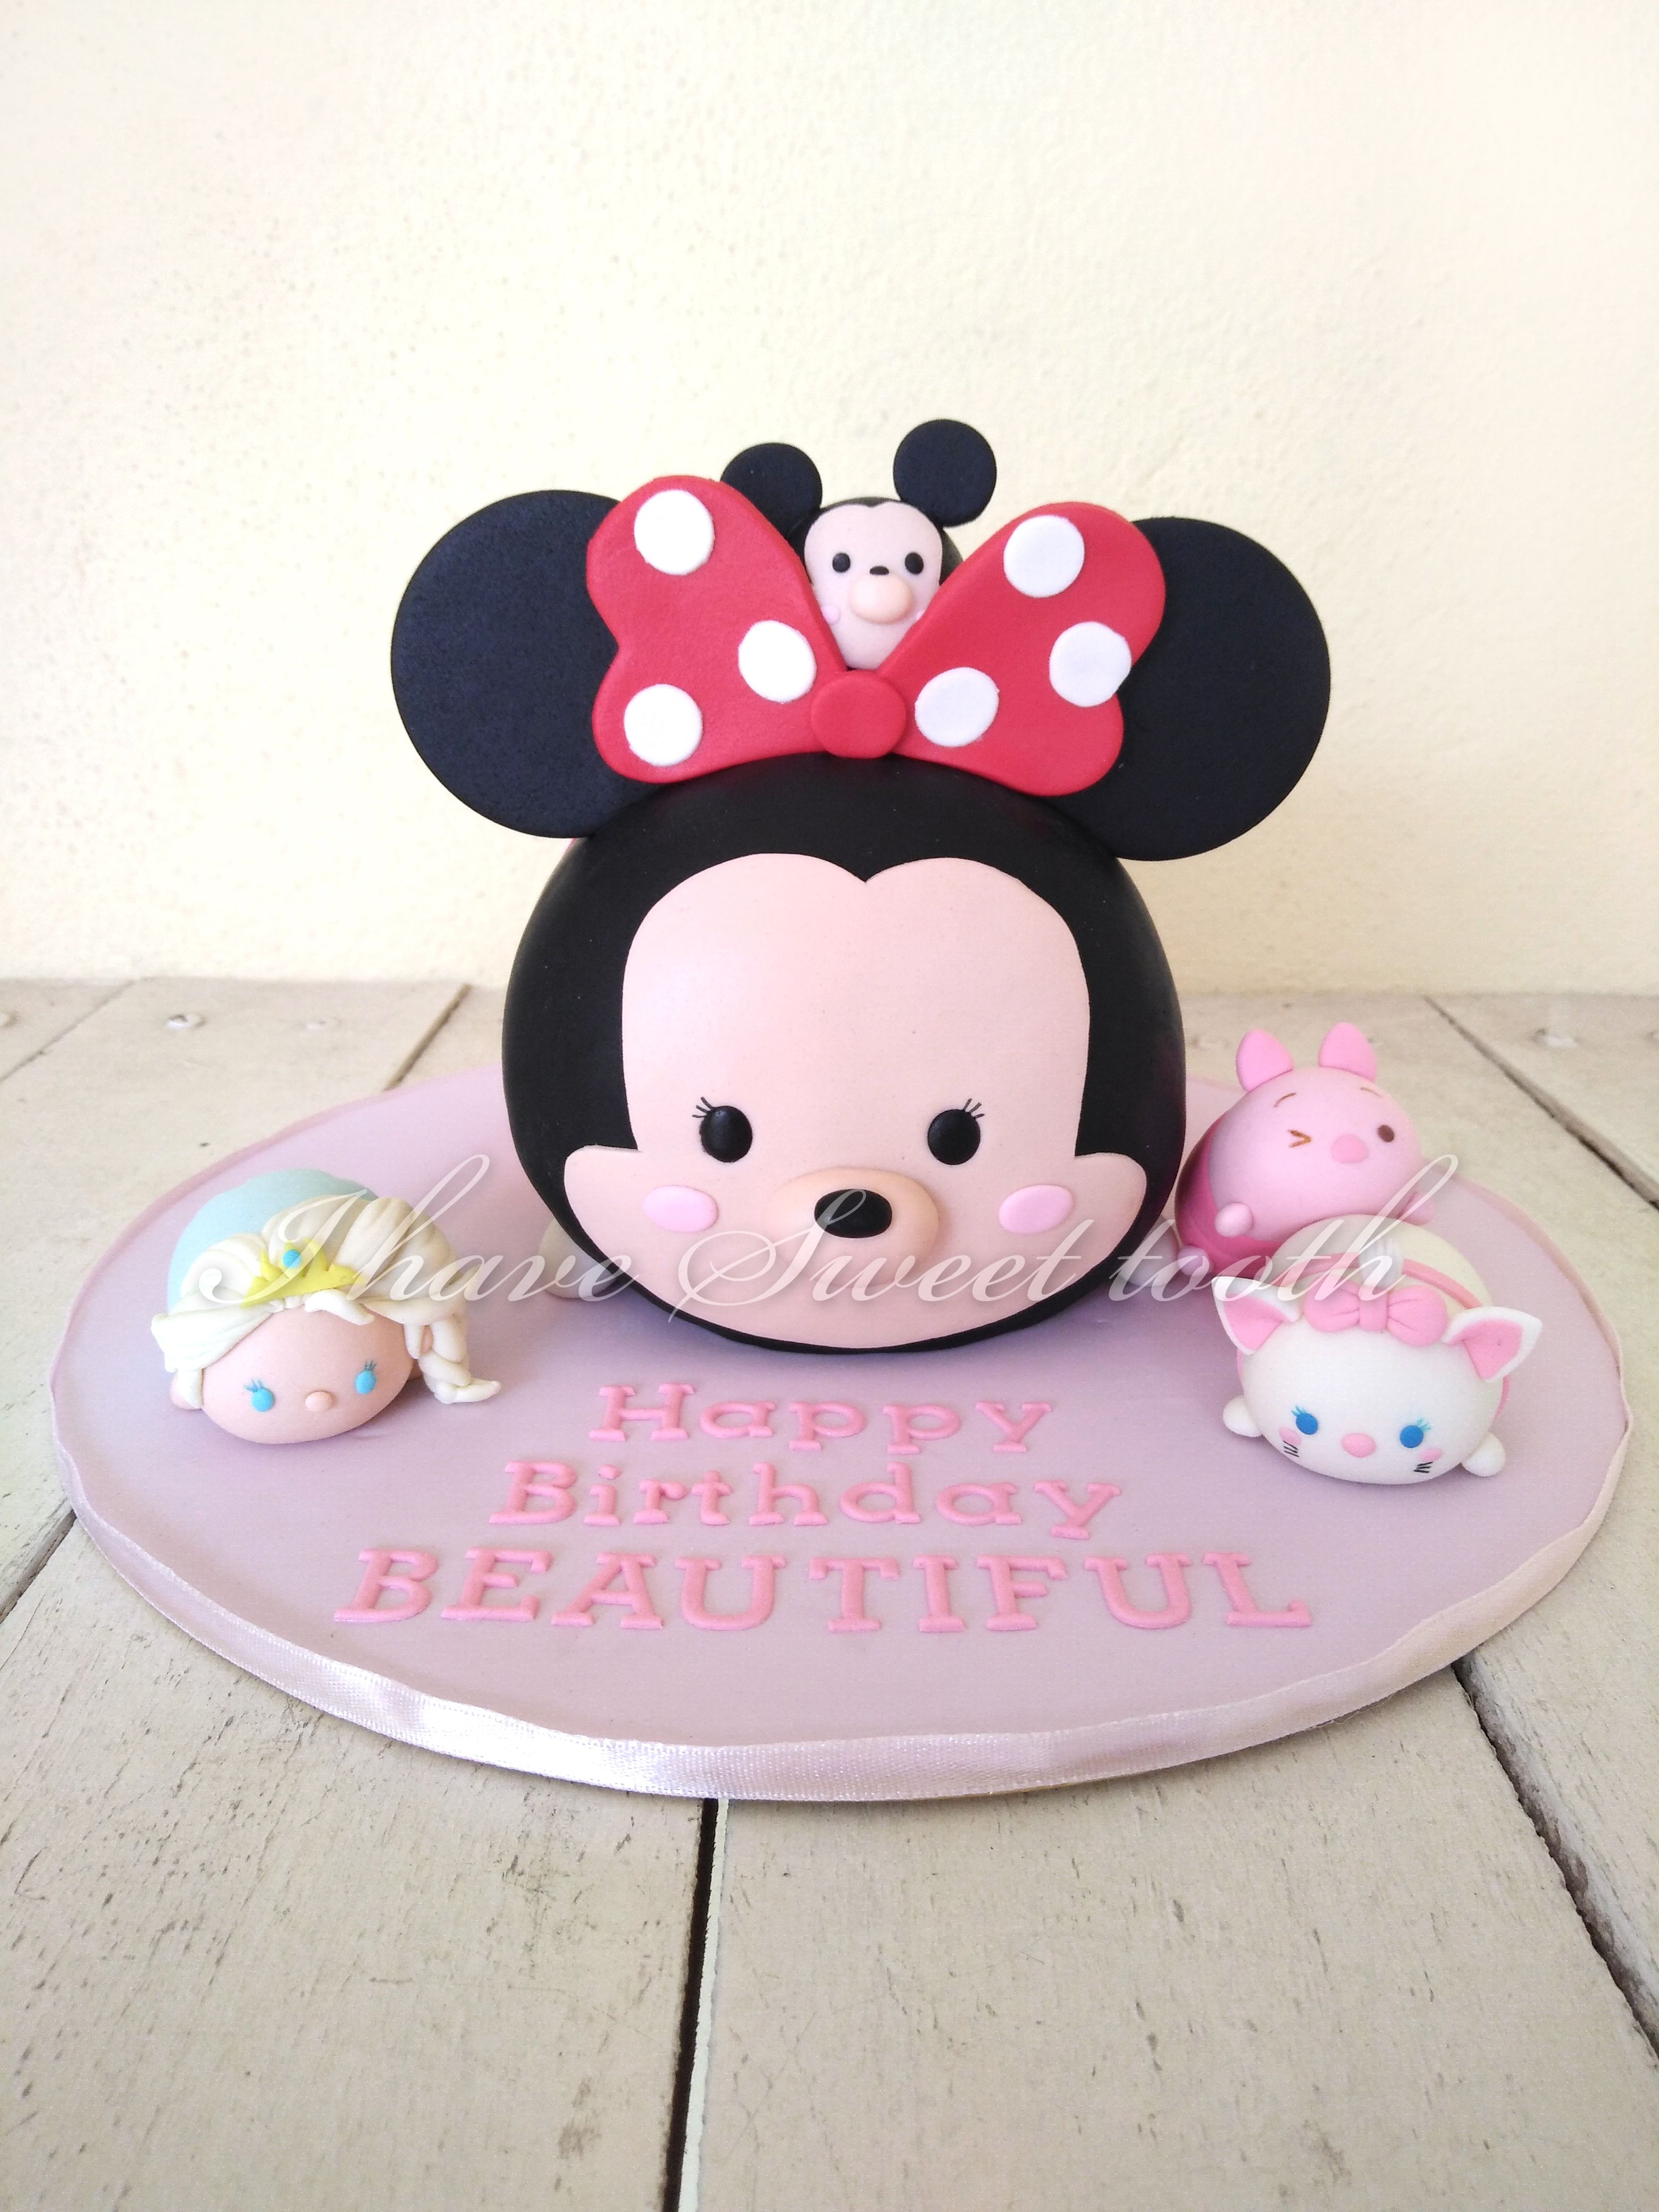 Birthday Party Ideas Tooth Dental Jelsa Tsum 3D Cake Ihavesweettooth Tsumtsum Disney Elsa Minnie Mickey